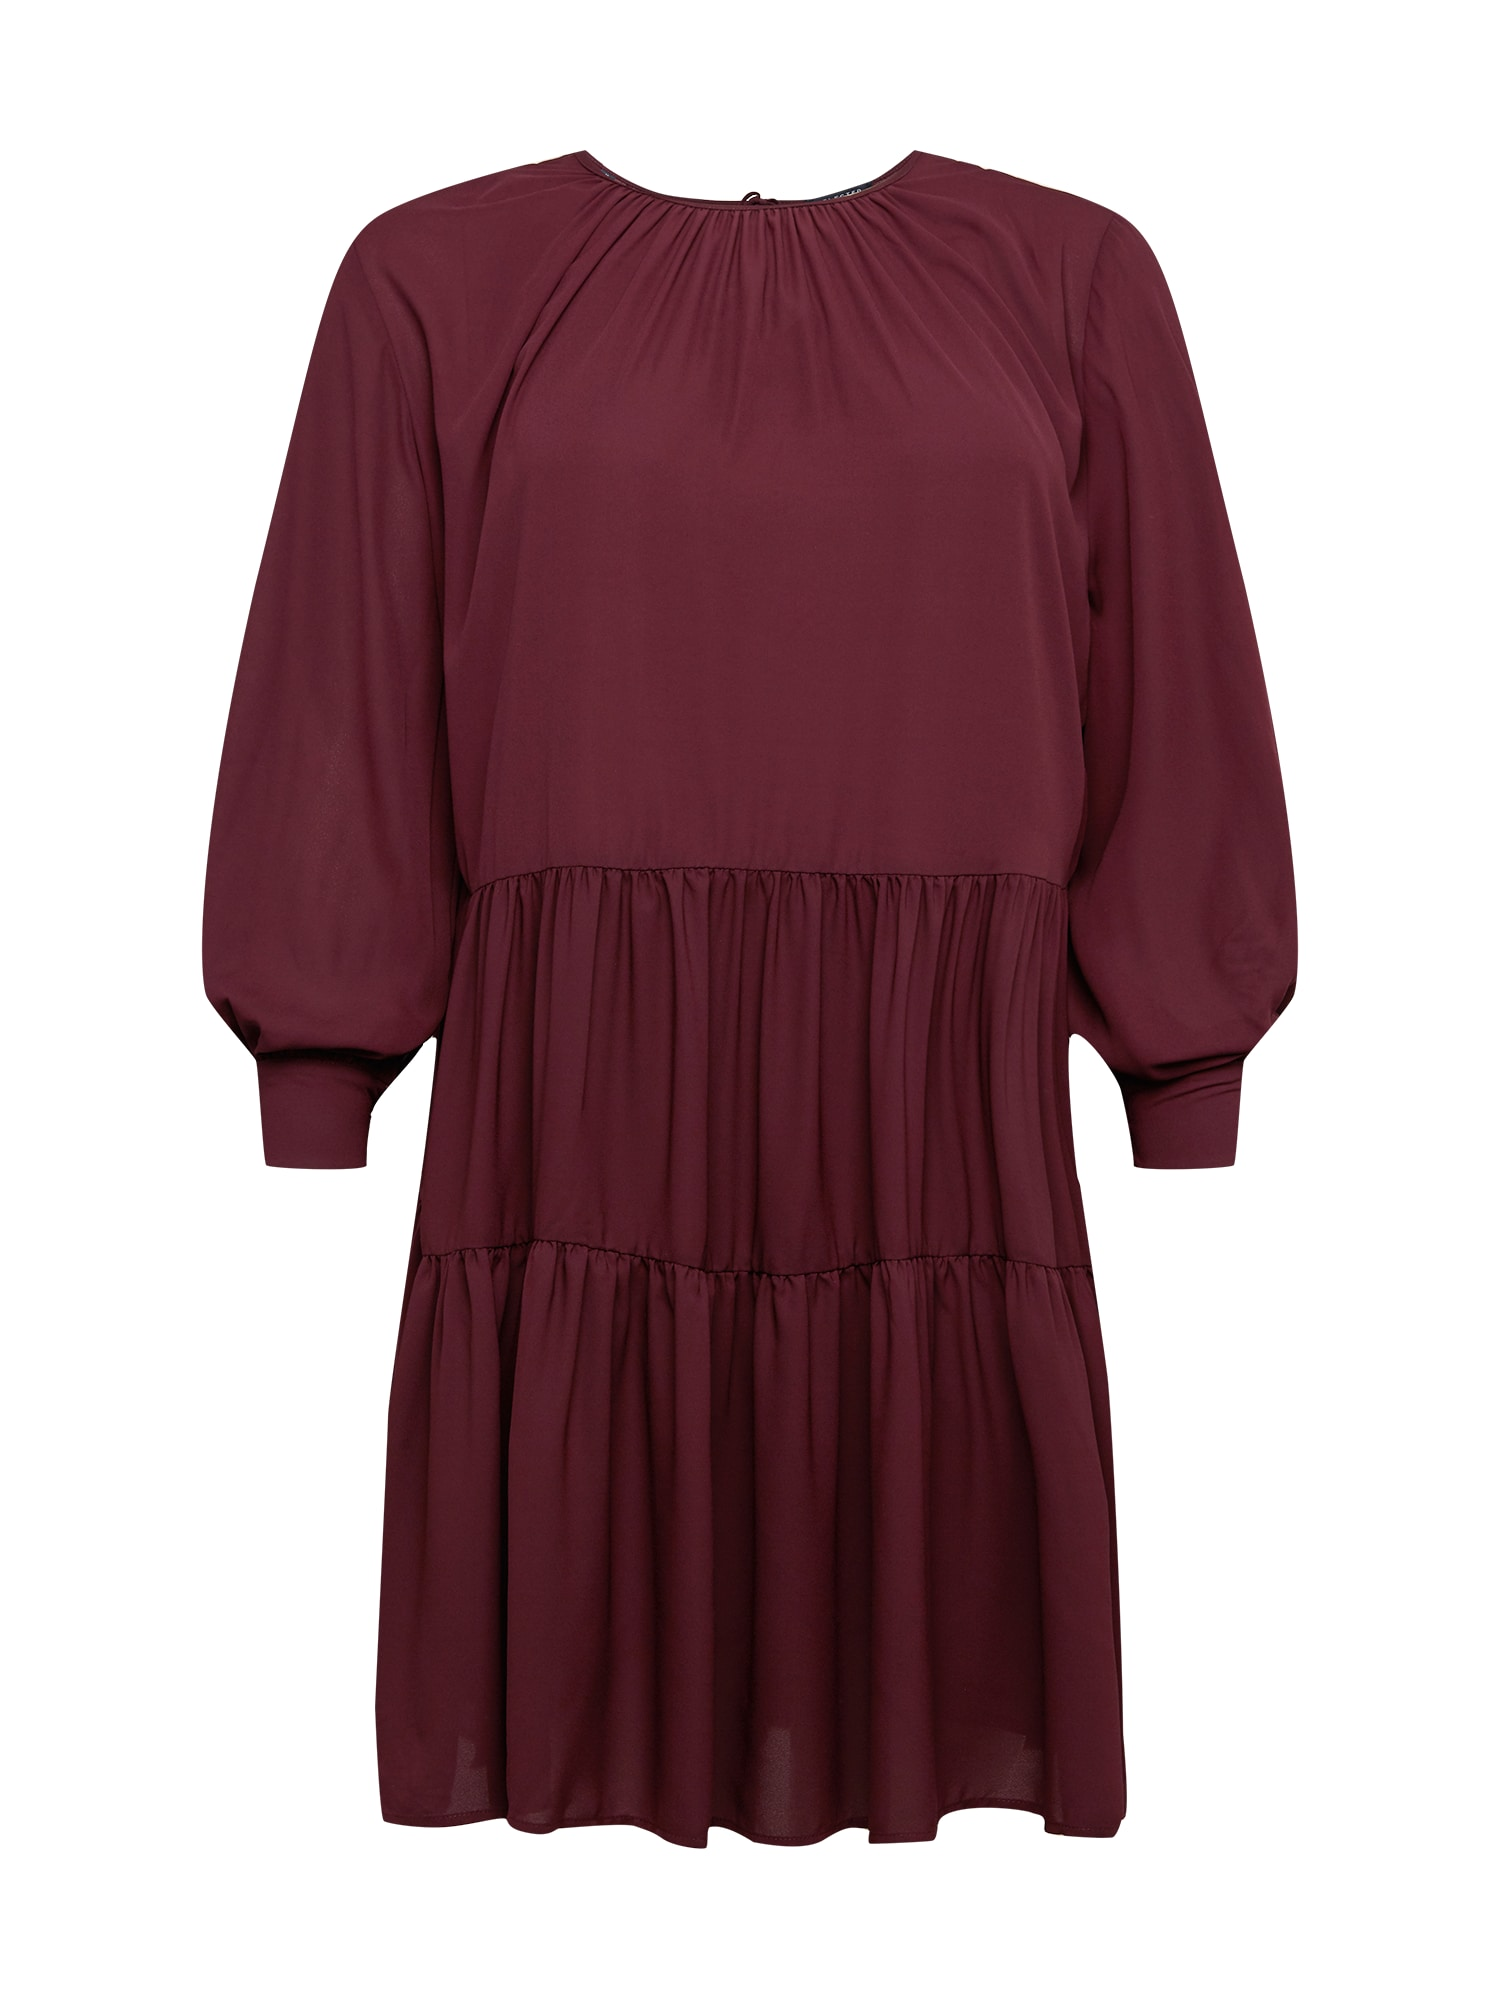 Selected Femme Curve Suknelė vyno raudona spalva